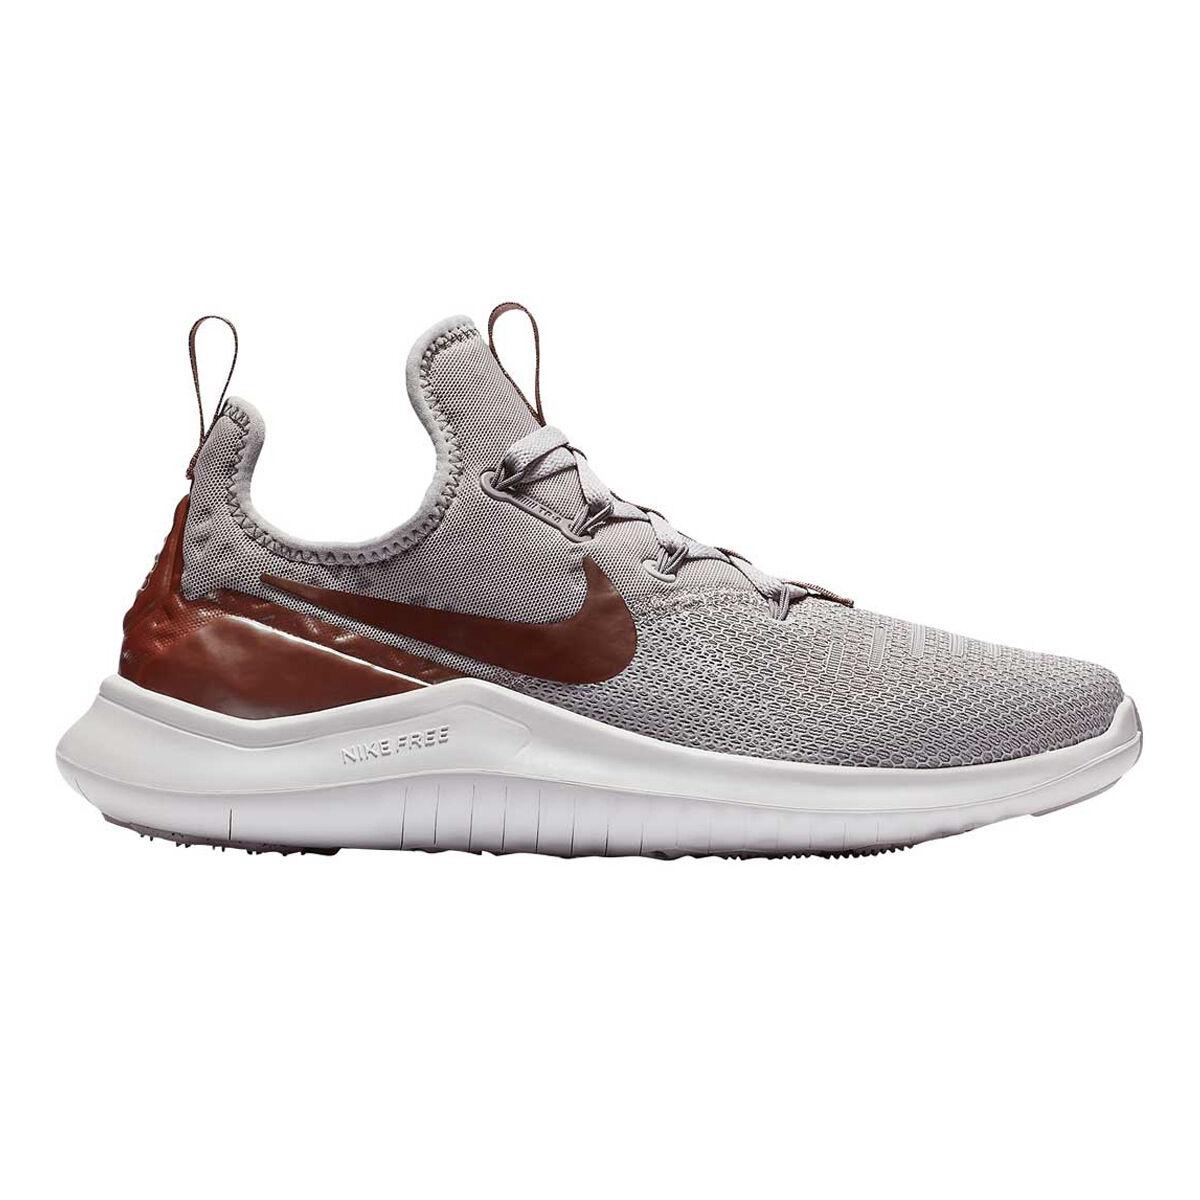 cheaper 32251 e34d9 Sport d entra femmeRebel Chaussures nement Nike pour 8 Tr Free xdBw8zR